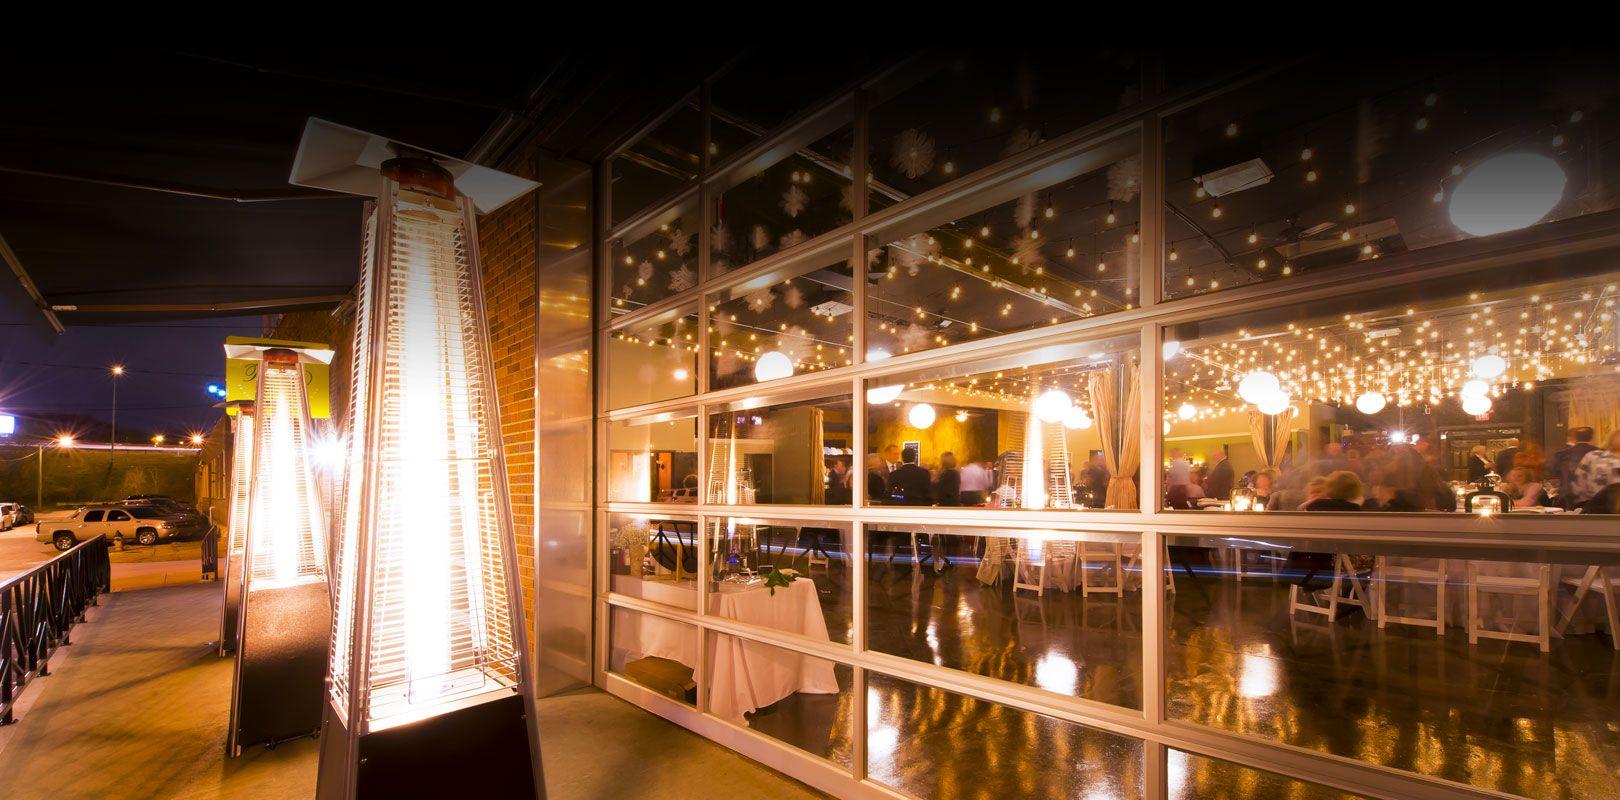 28 Event Space Urban Wedding Reception Venue Downtown Kansas City